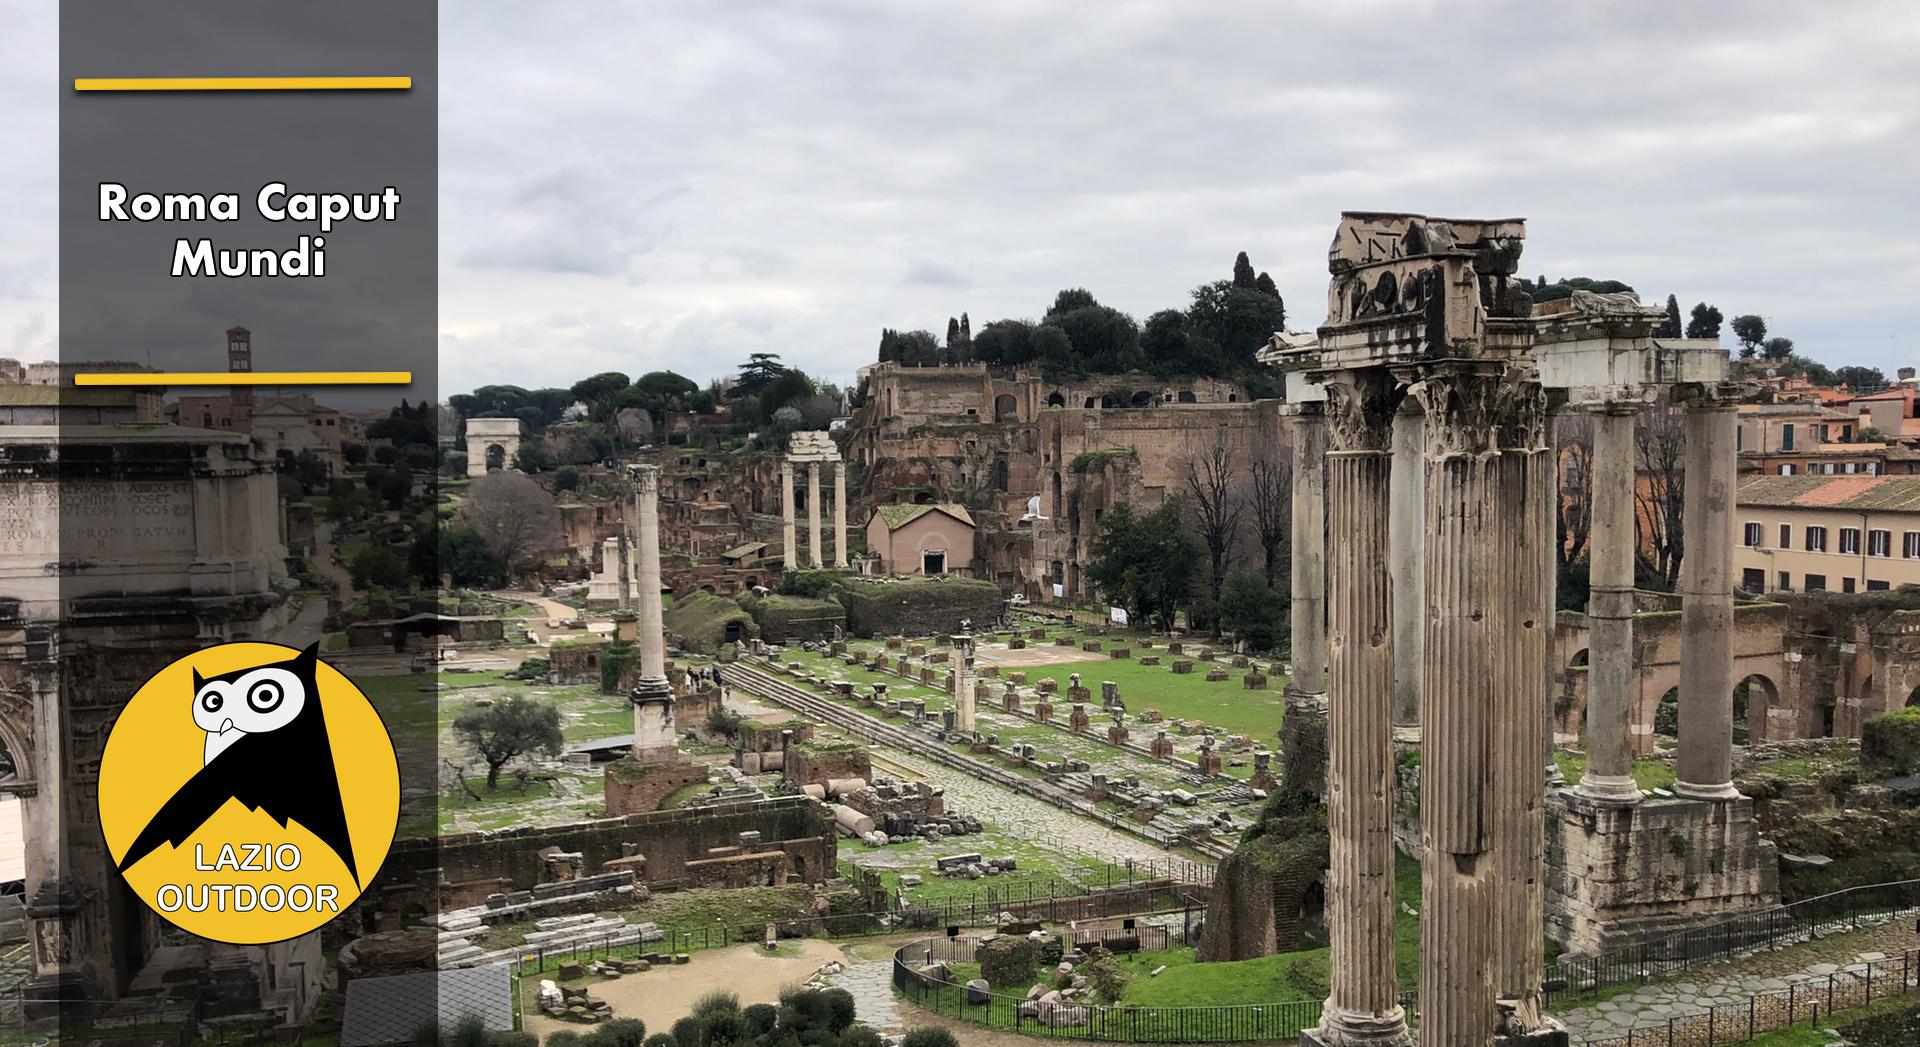 Roma Caput Mundi 1